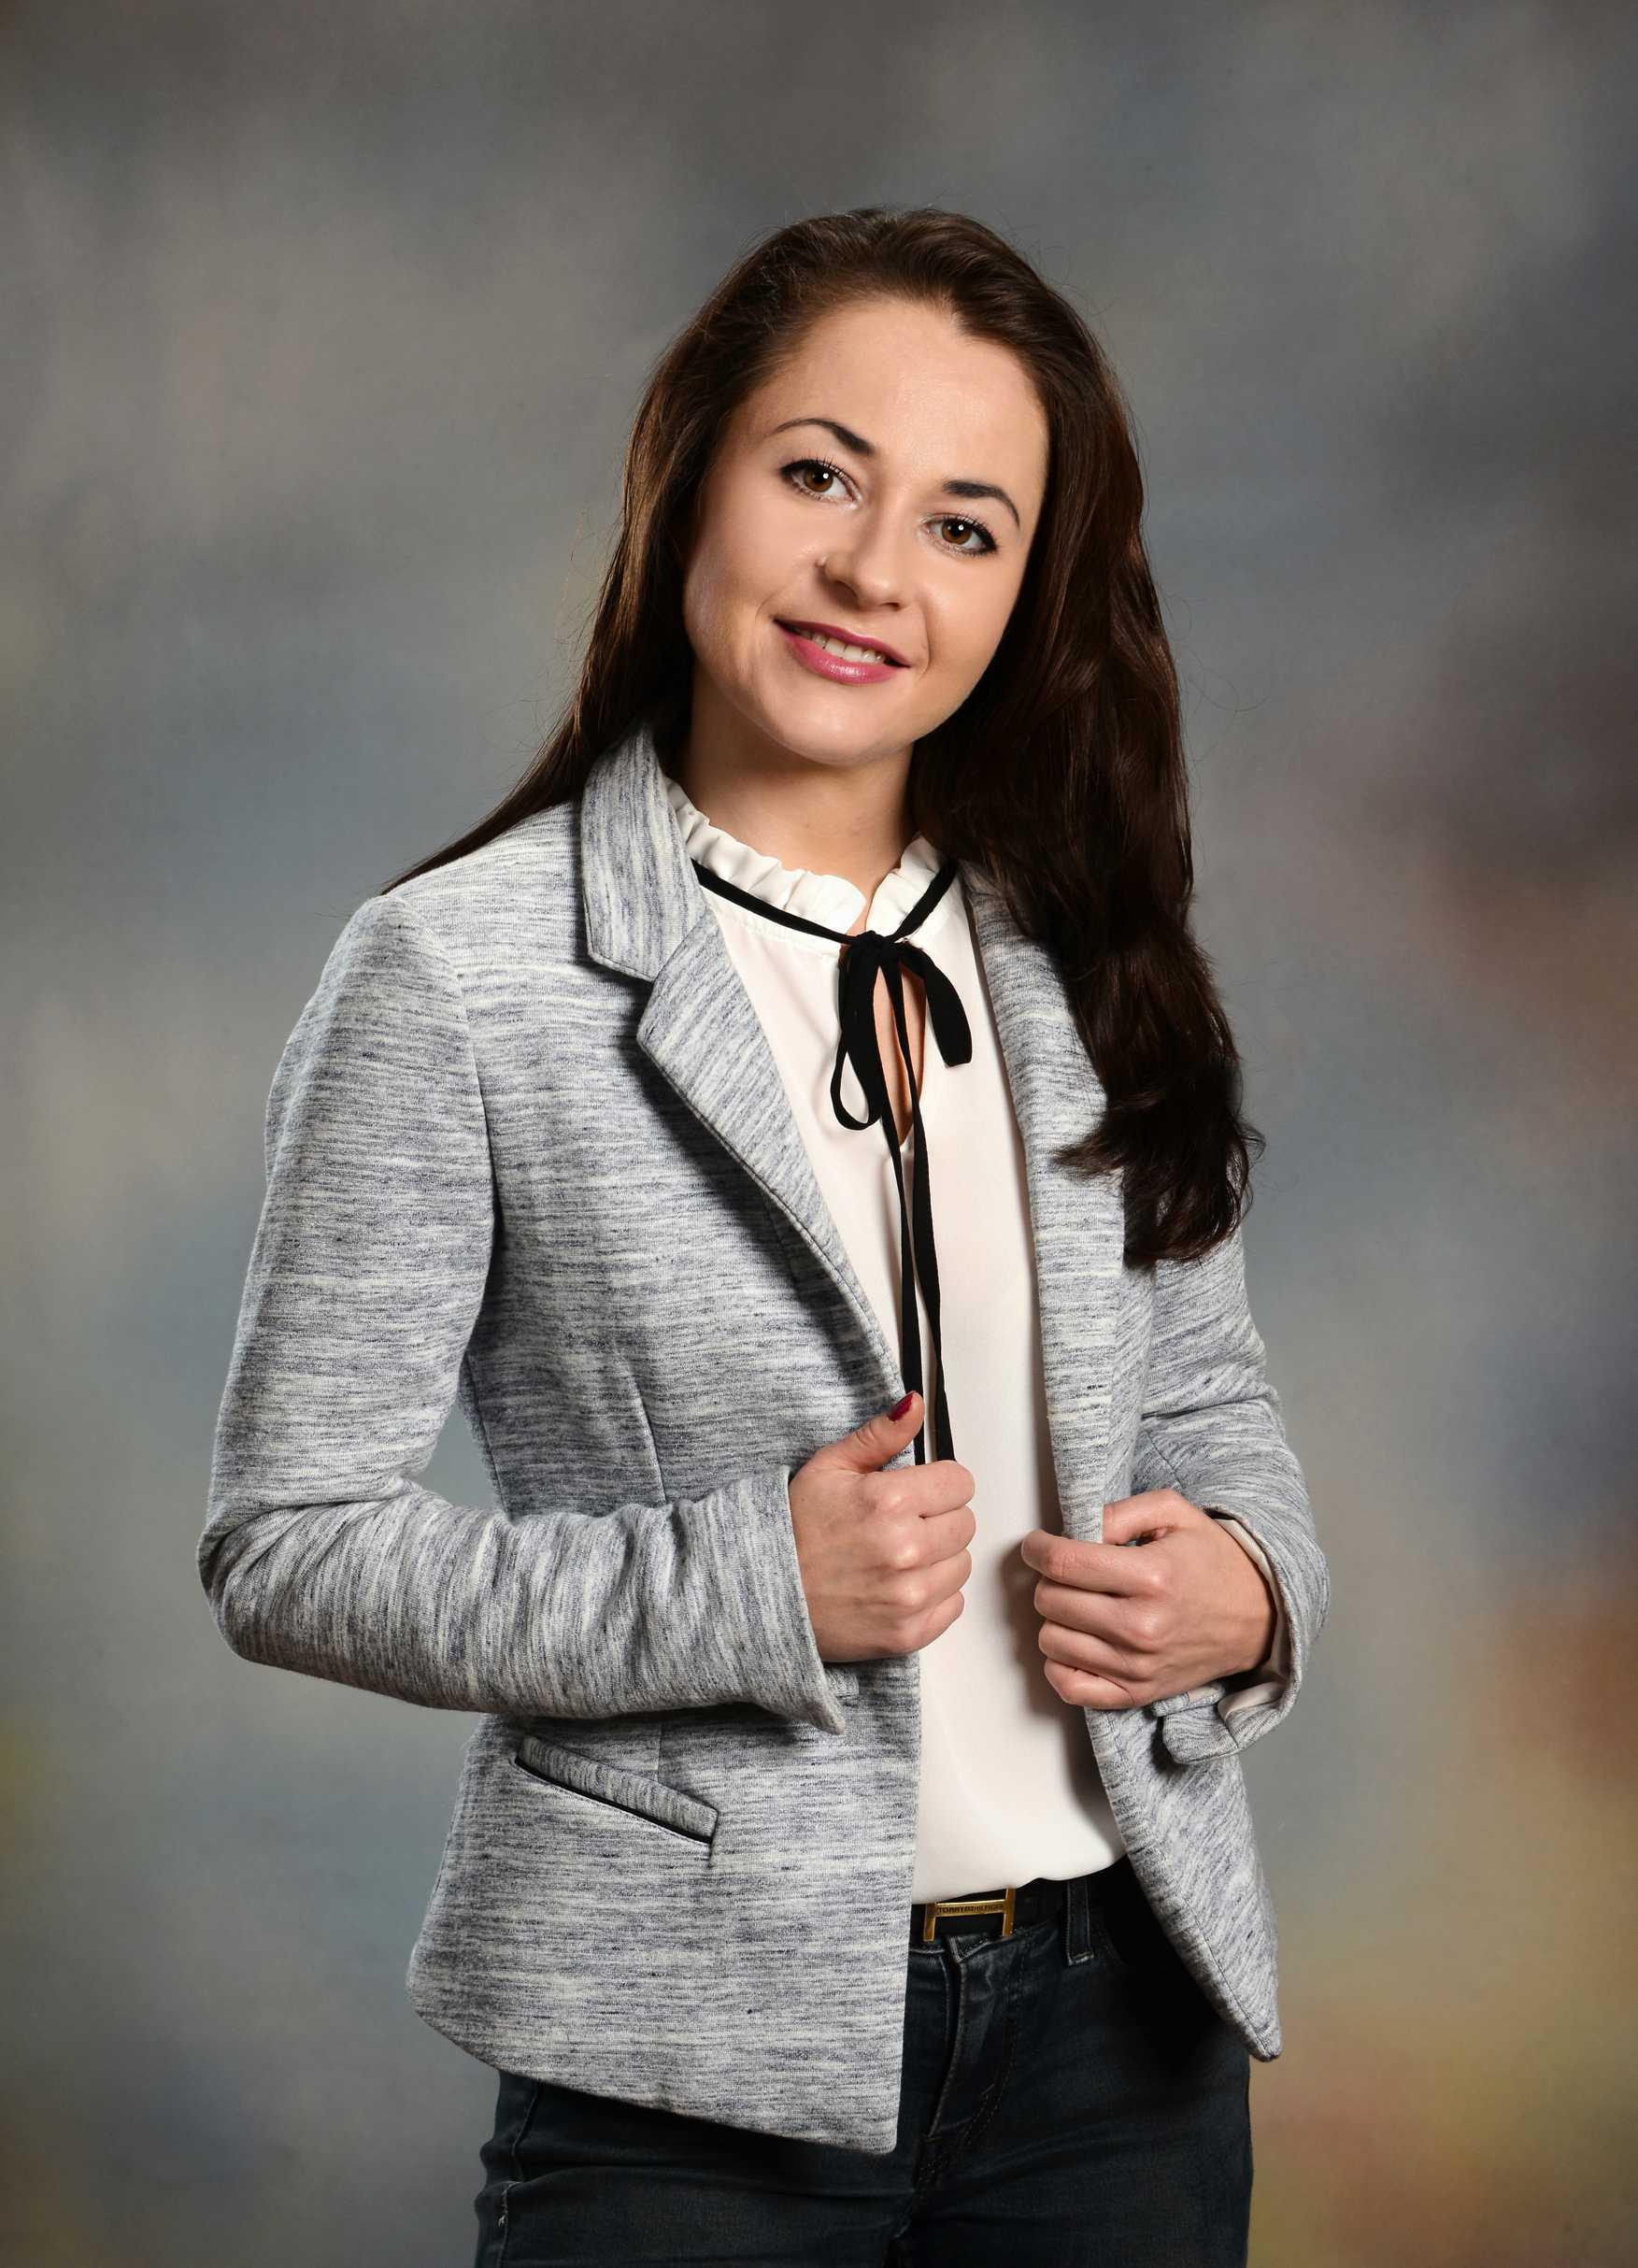 joanna-krzywkowska